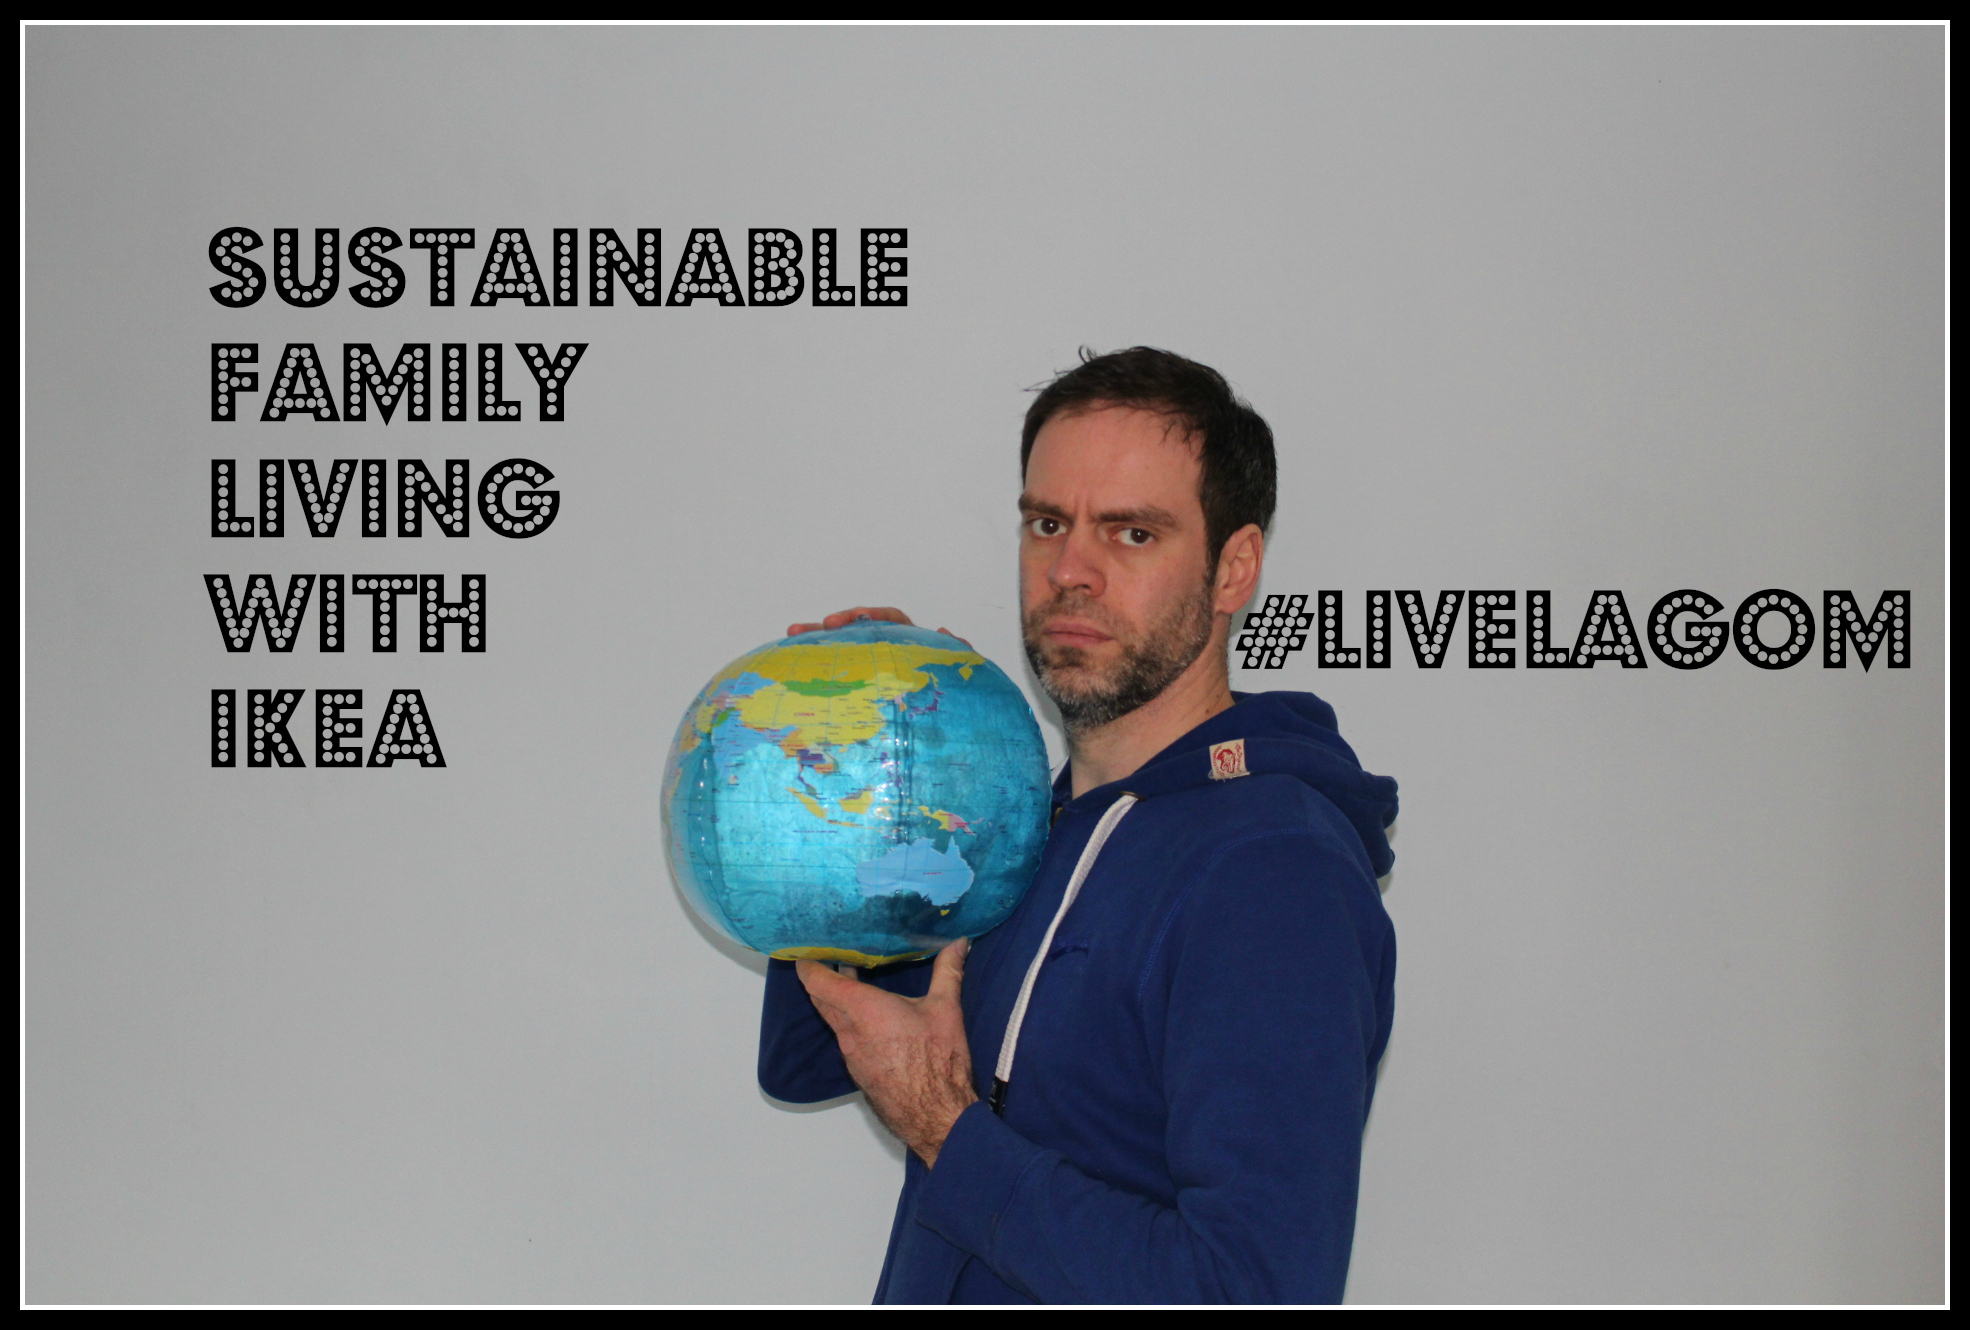 #liveLAGOM, live LAGOM, Ikea, sustainable living, environmentally friendly, green living